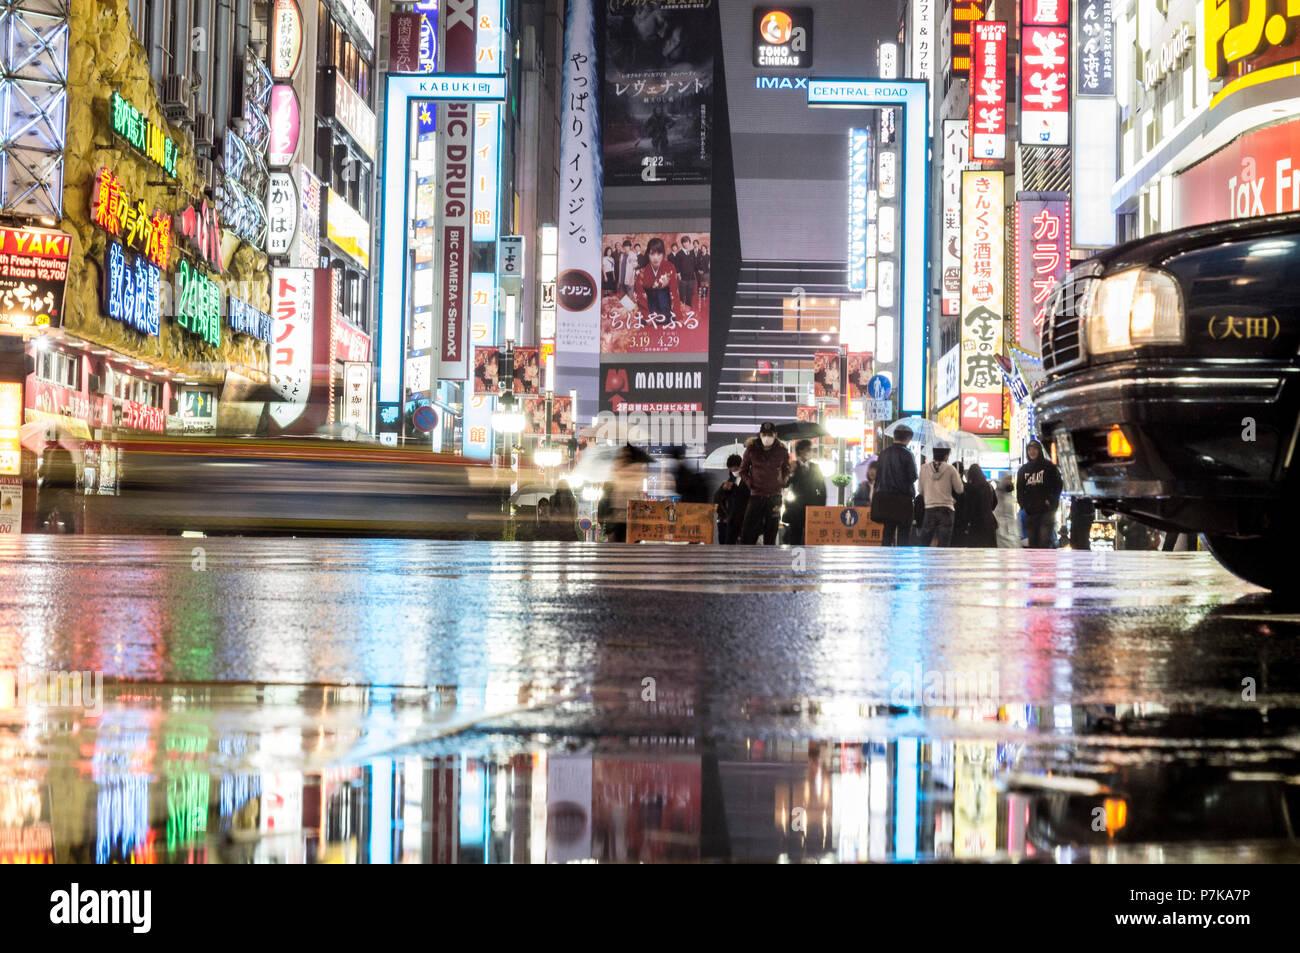 Nightlife in Tokyo - Stock Image